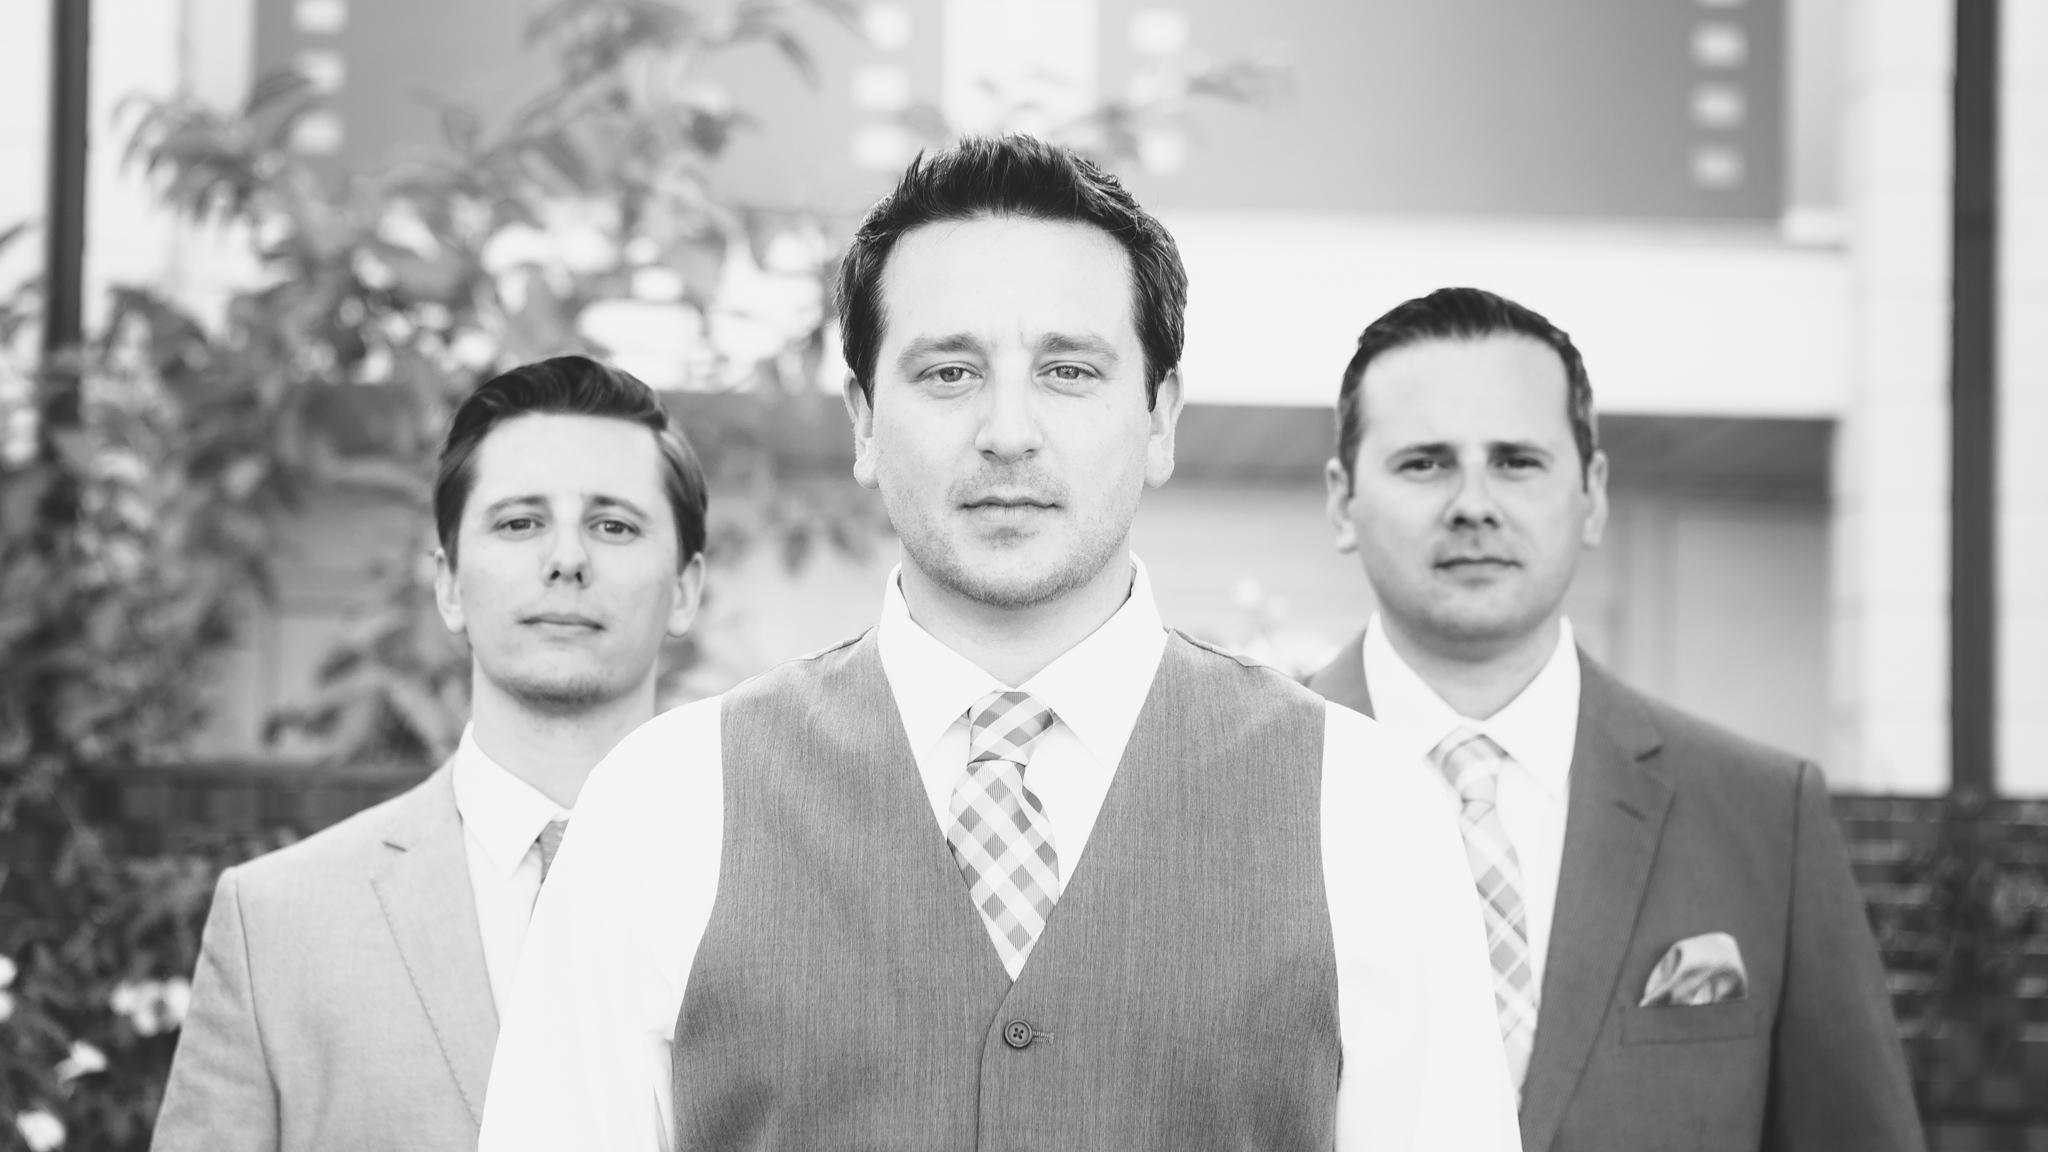 scottsdale-wedding-photographer-el-dorado-groom-brothers-epic-black-and-white